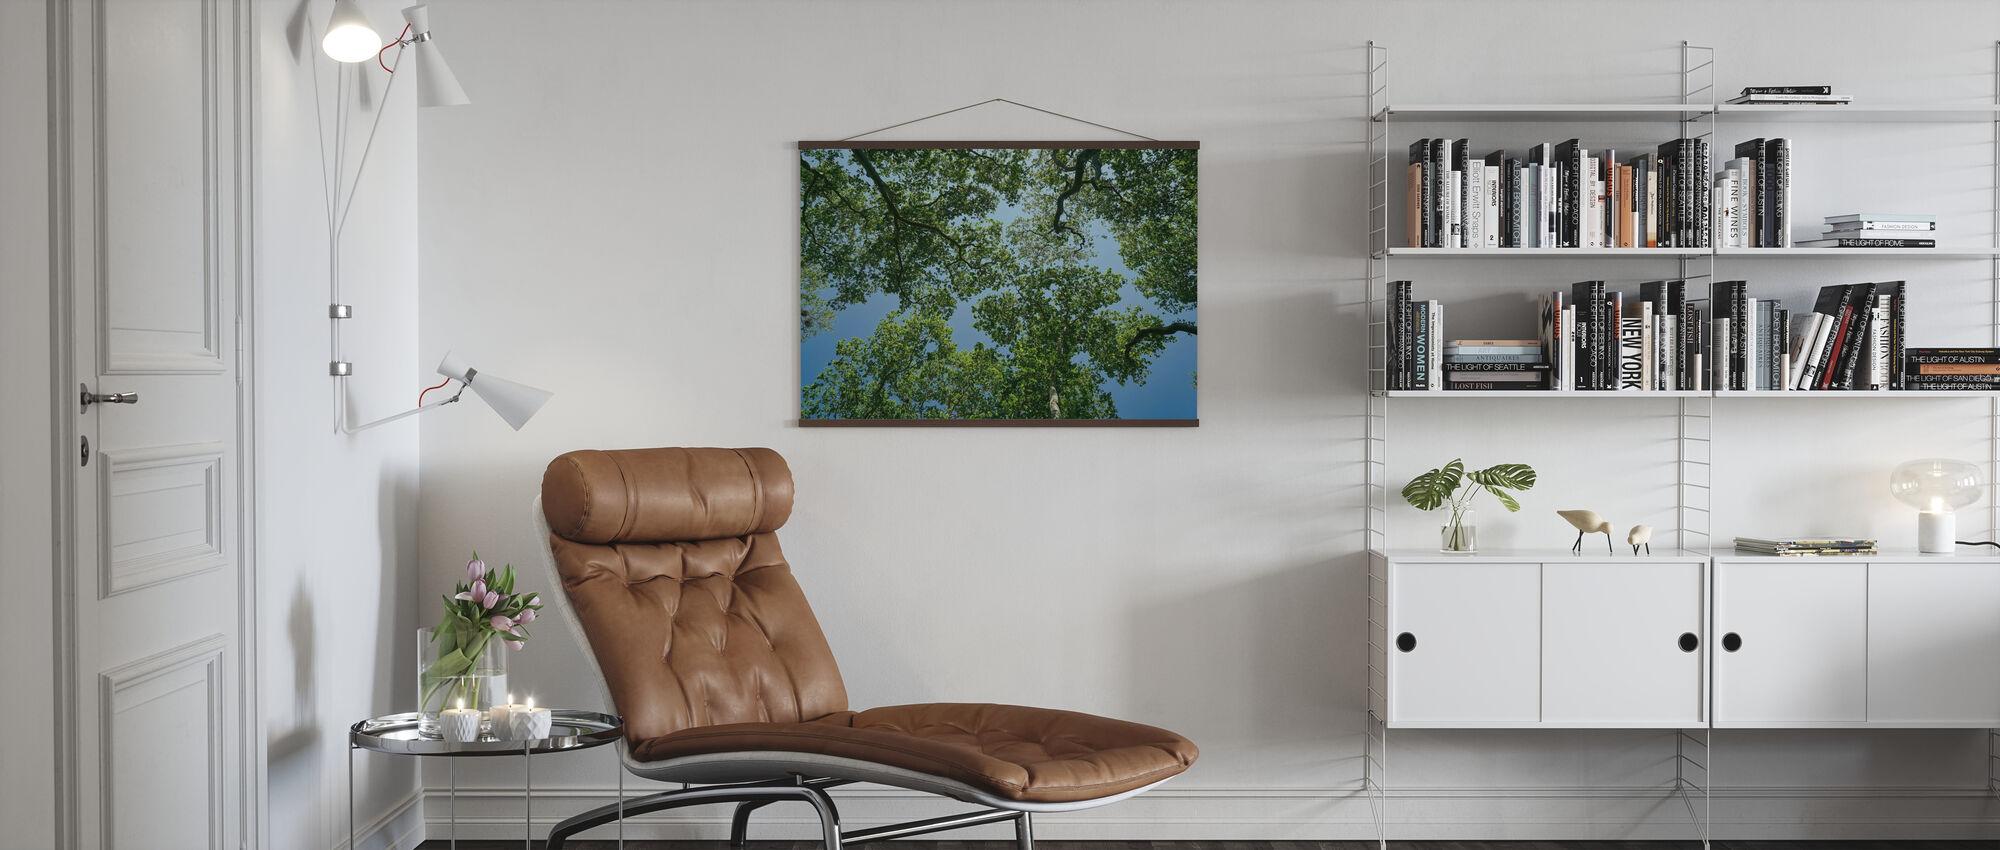 Skogtrær - Plakat - Stue